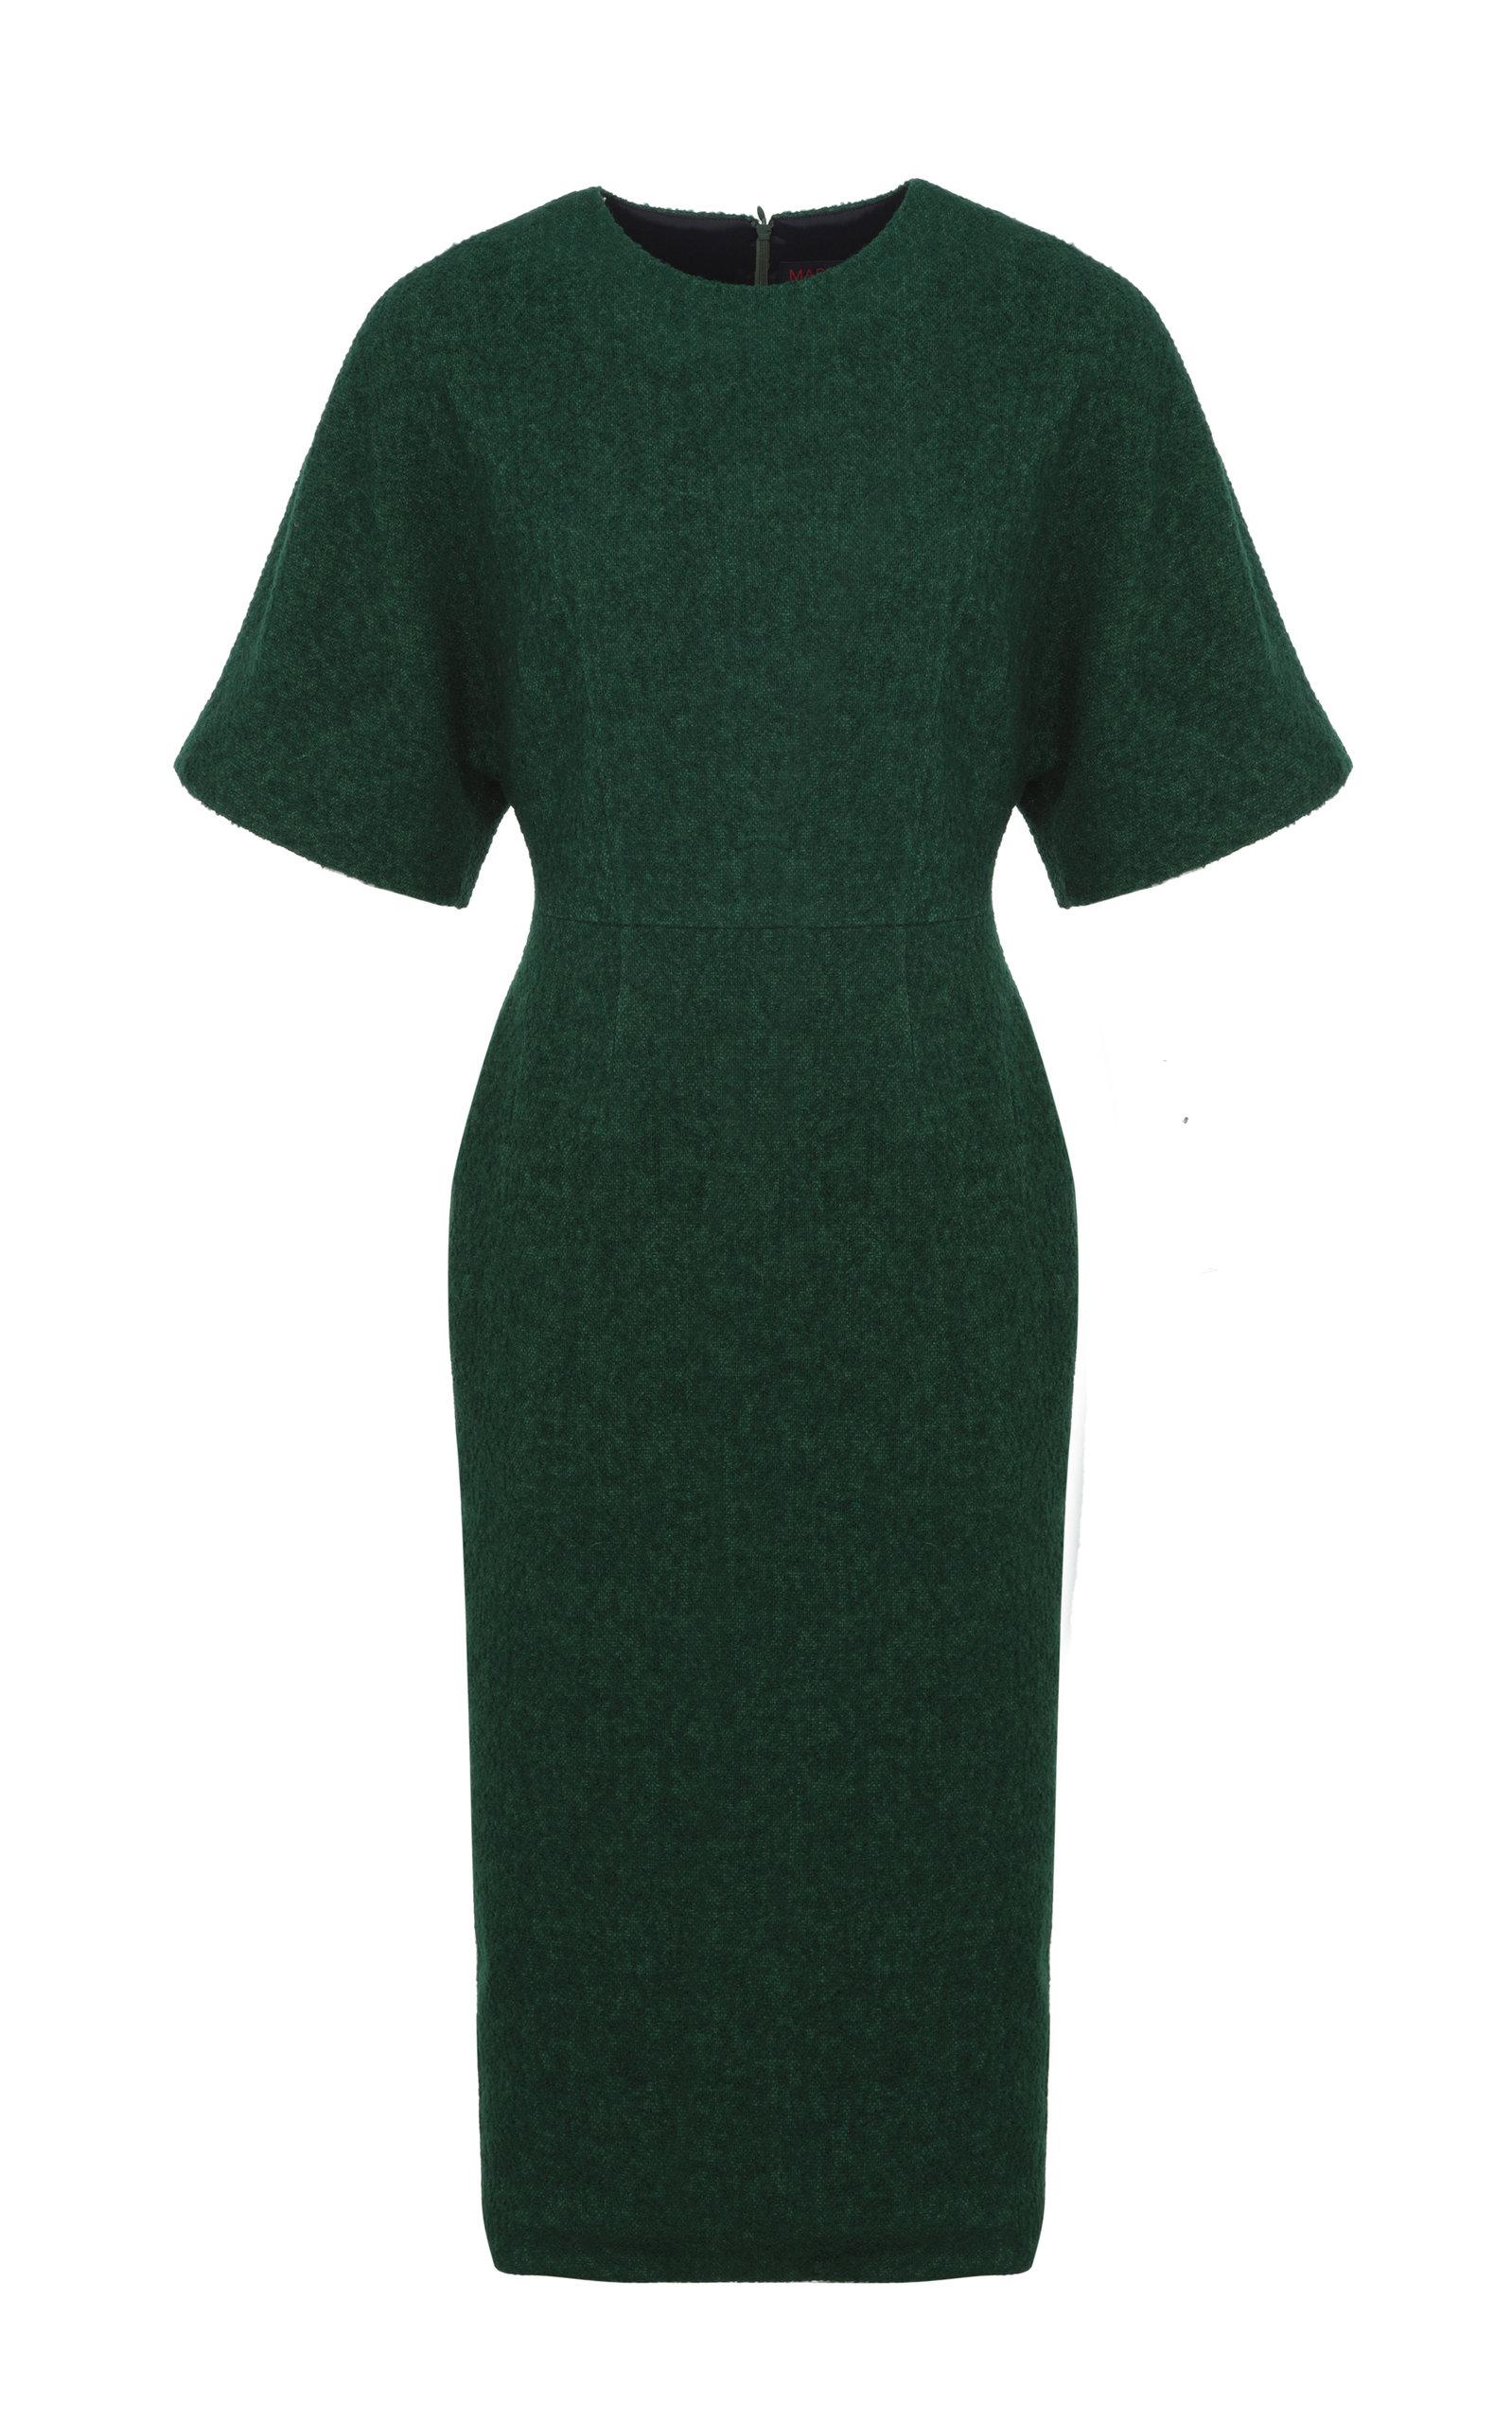 Martin Grant Women's Batwing Cotton-blend Midi Dress In Green